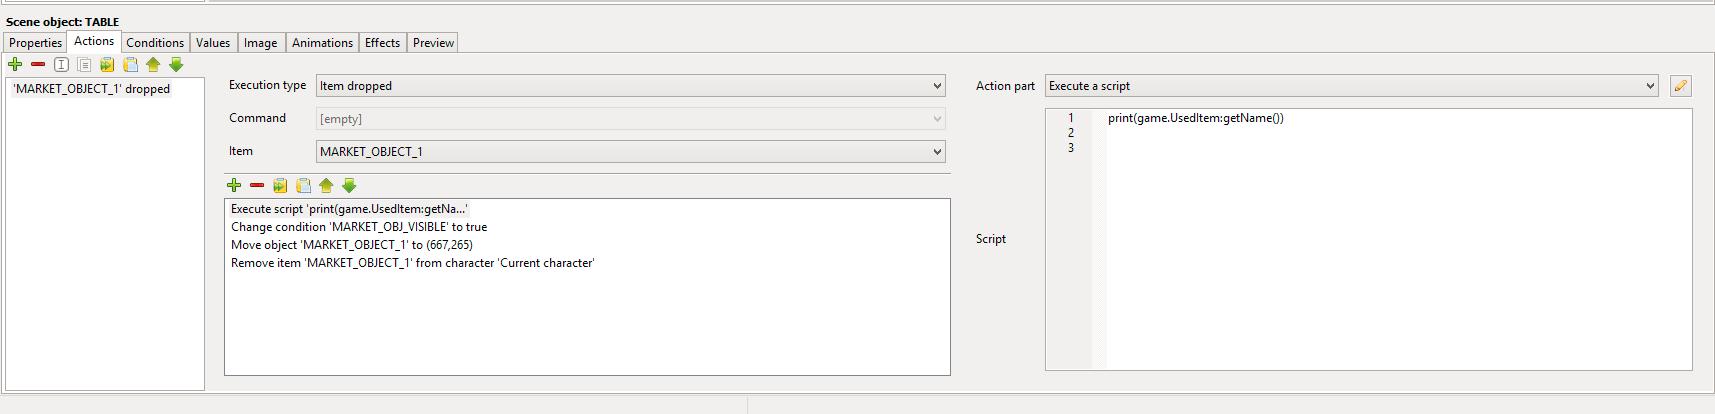 LUA Script to access dropped item name